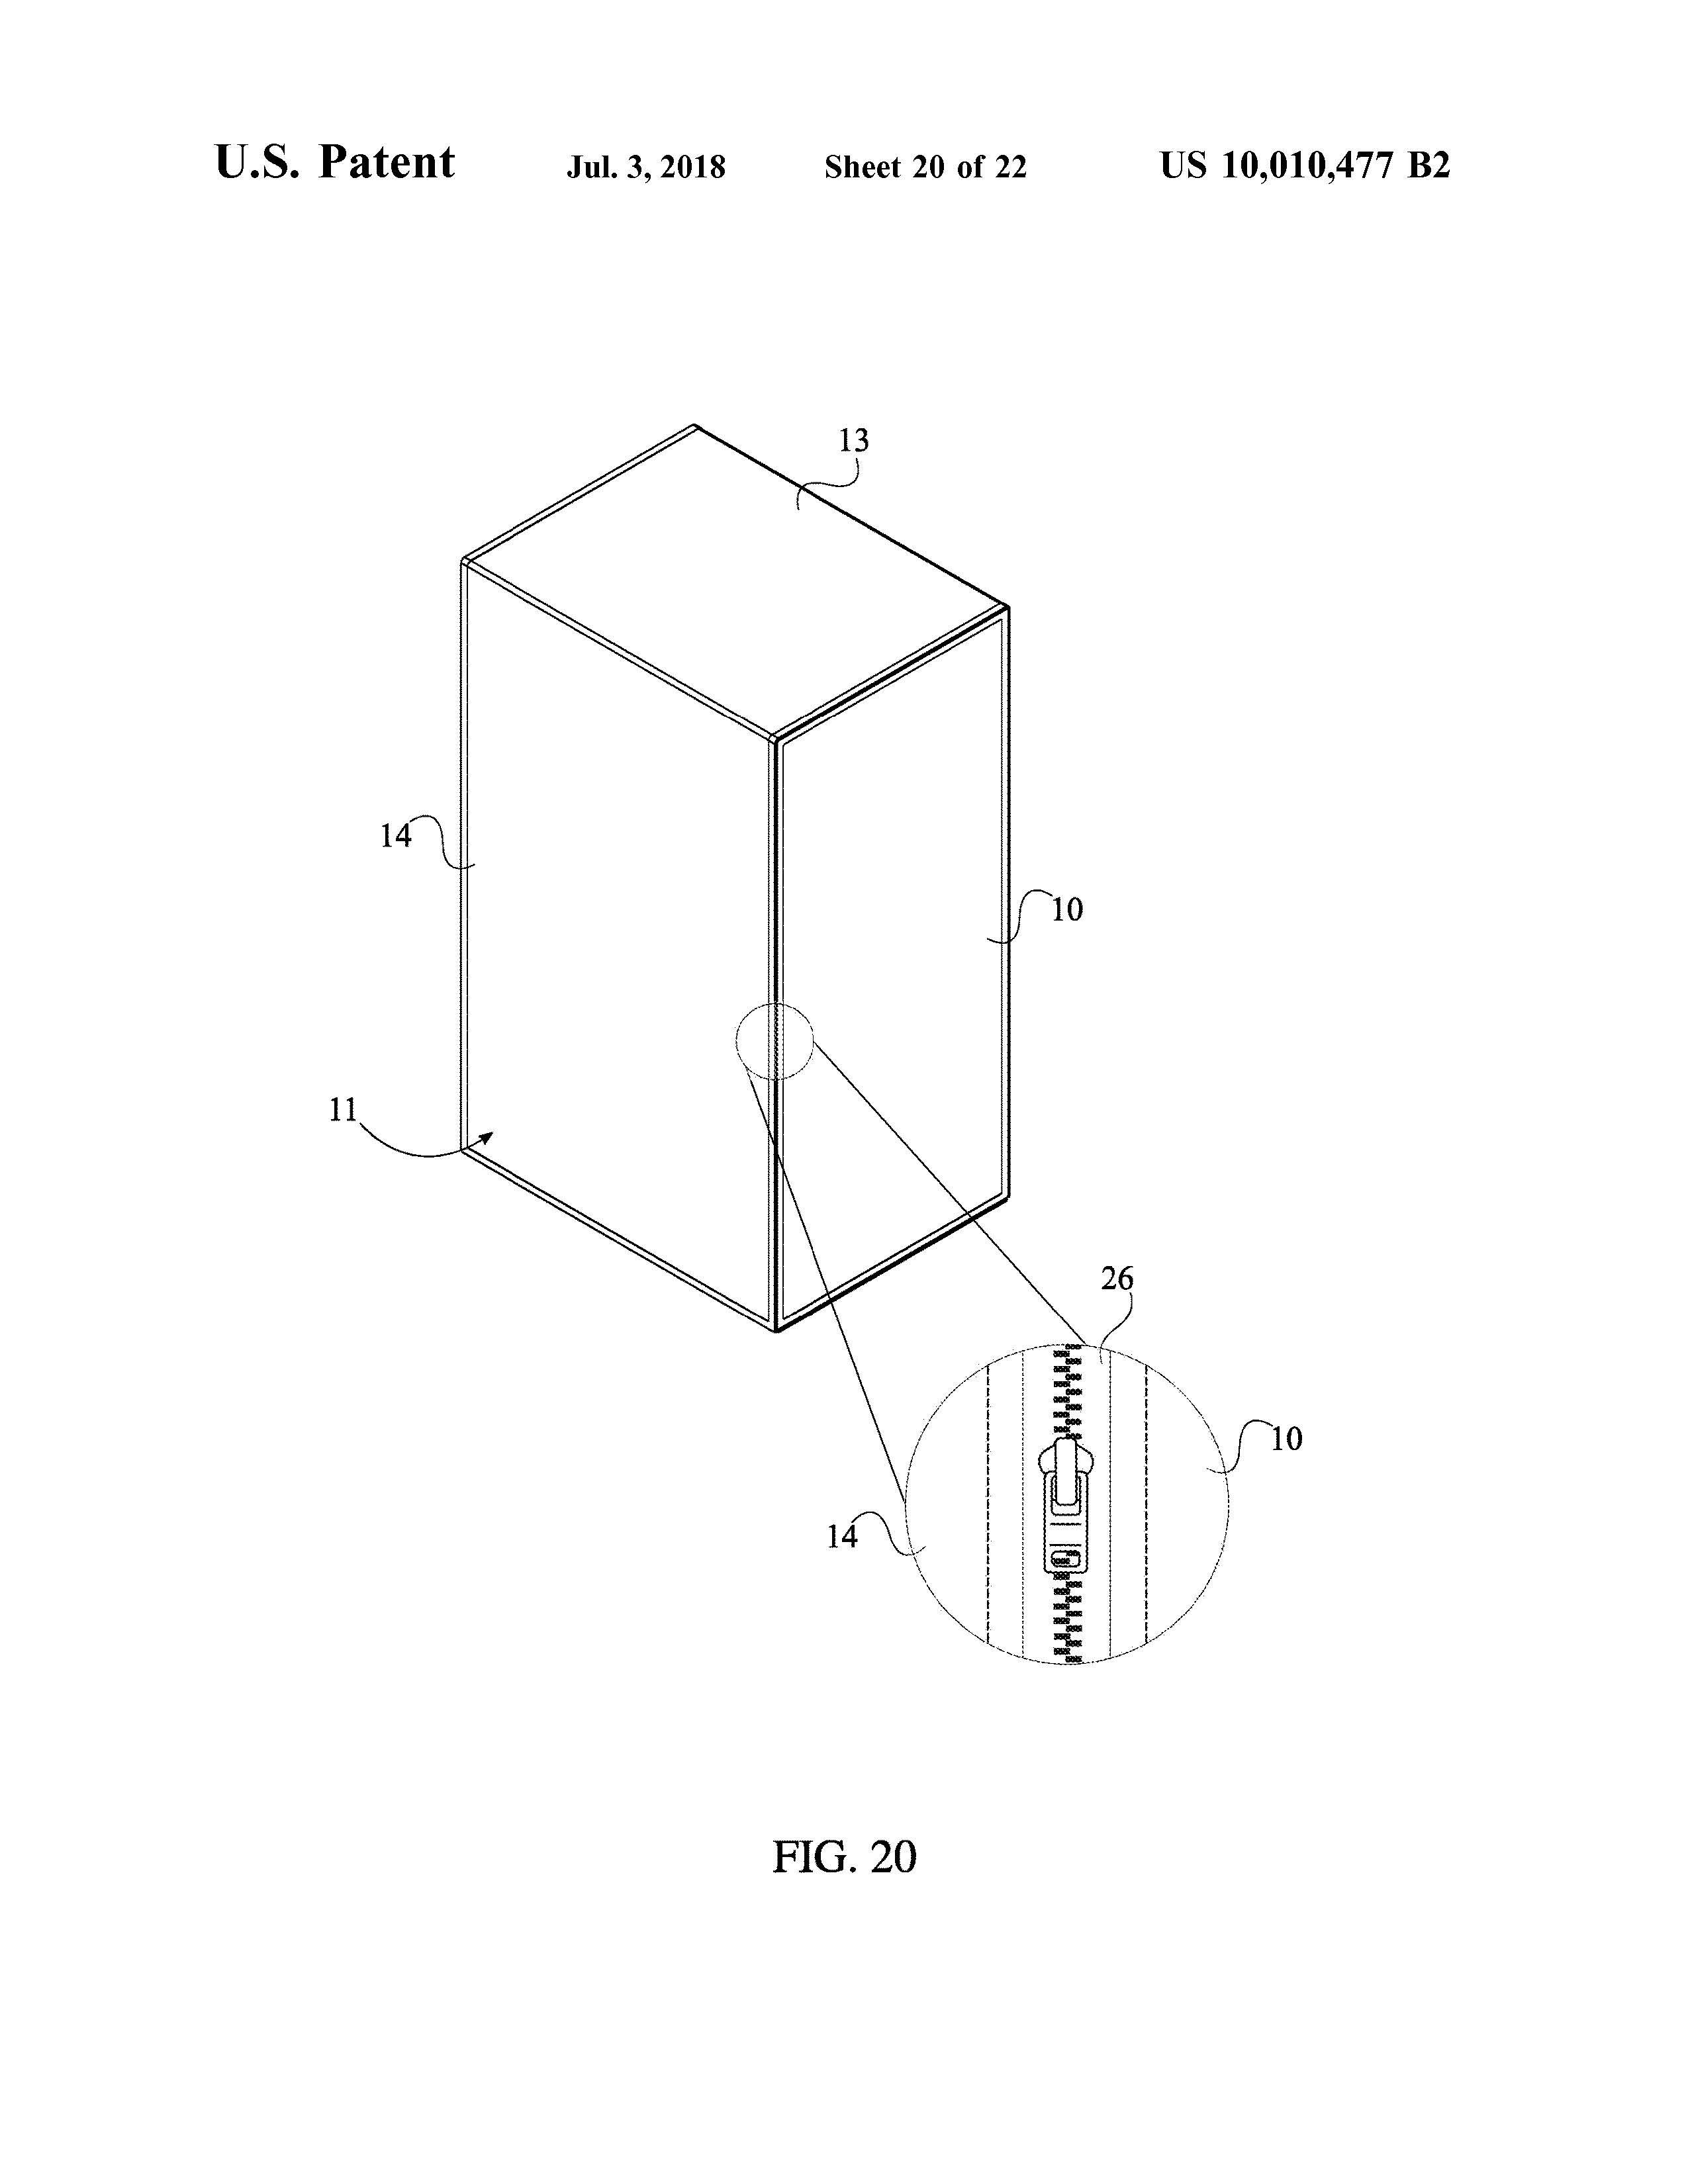 Sauna Tent Patent Page 22